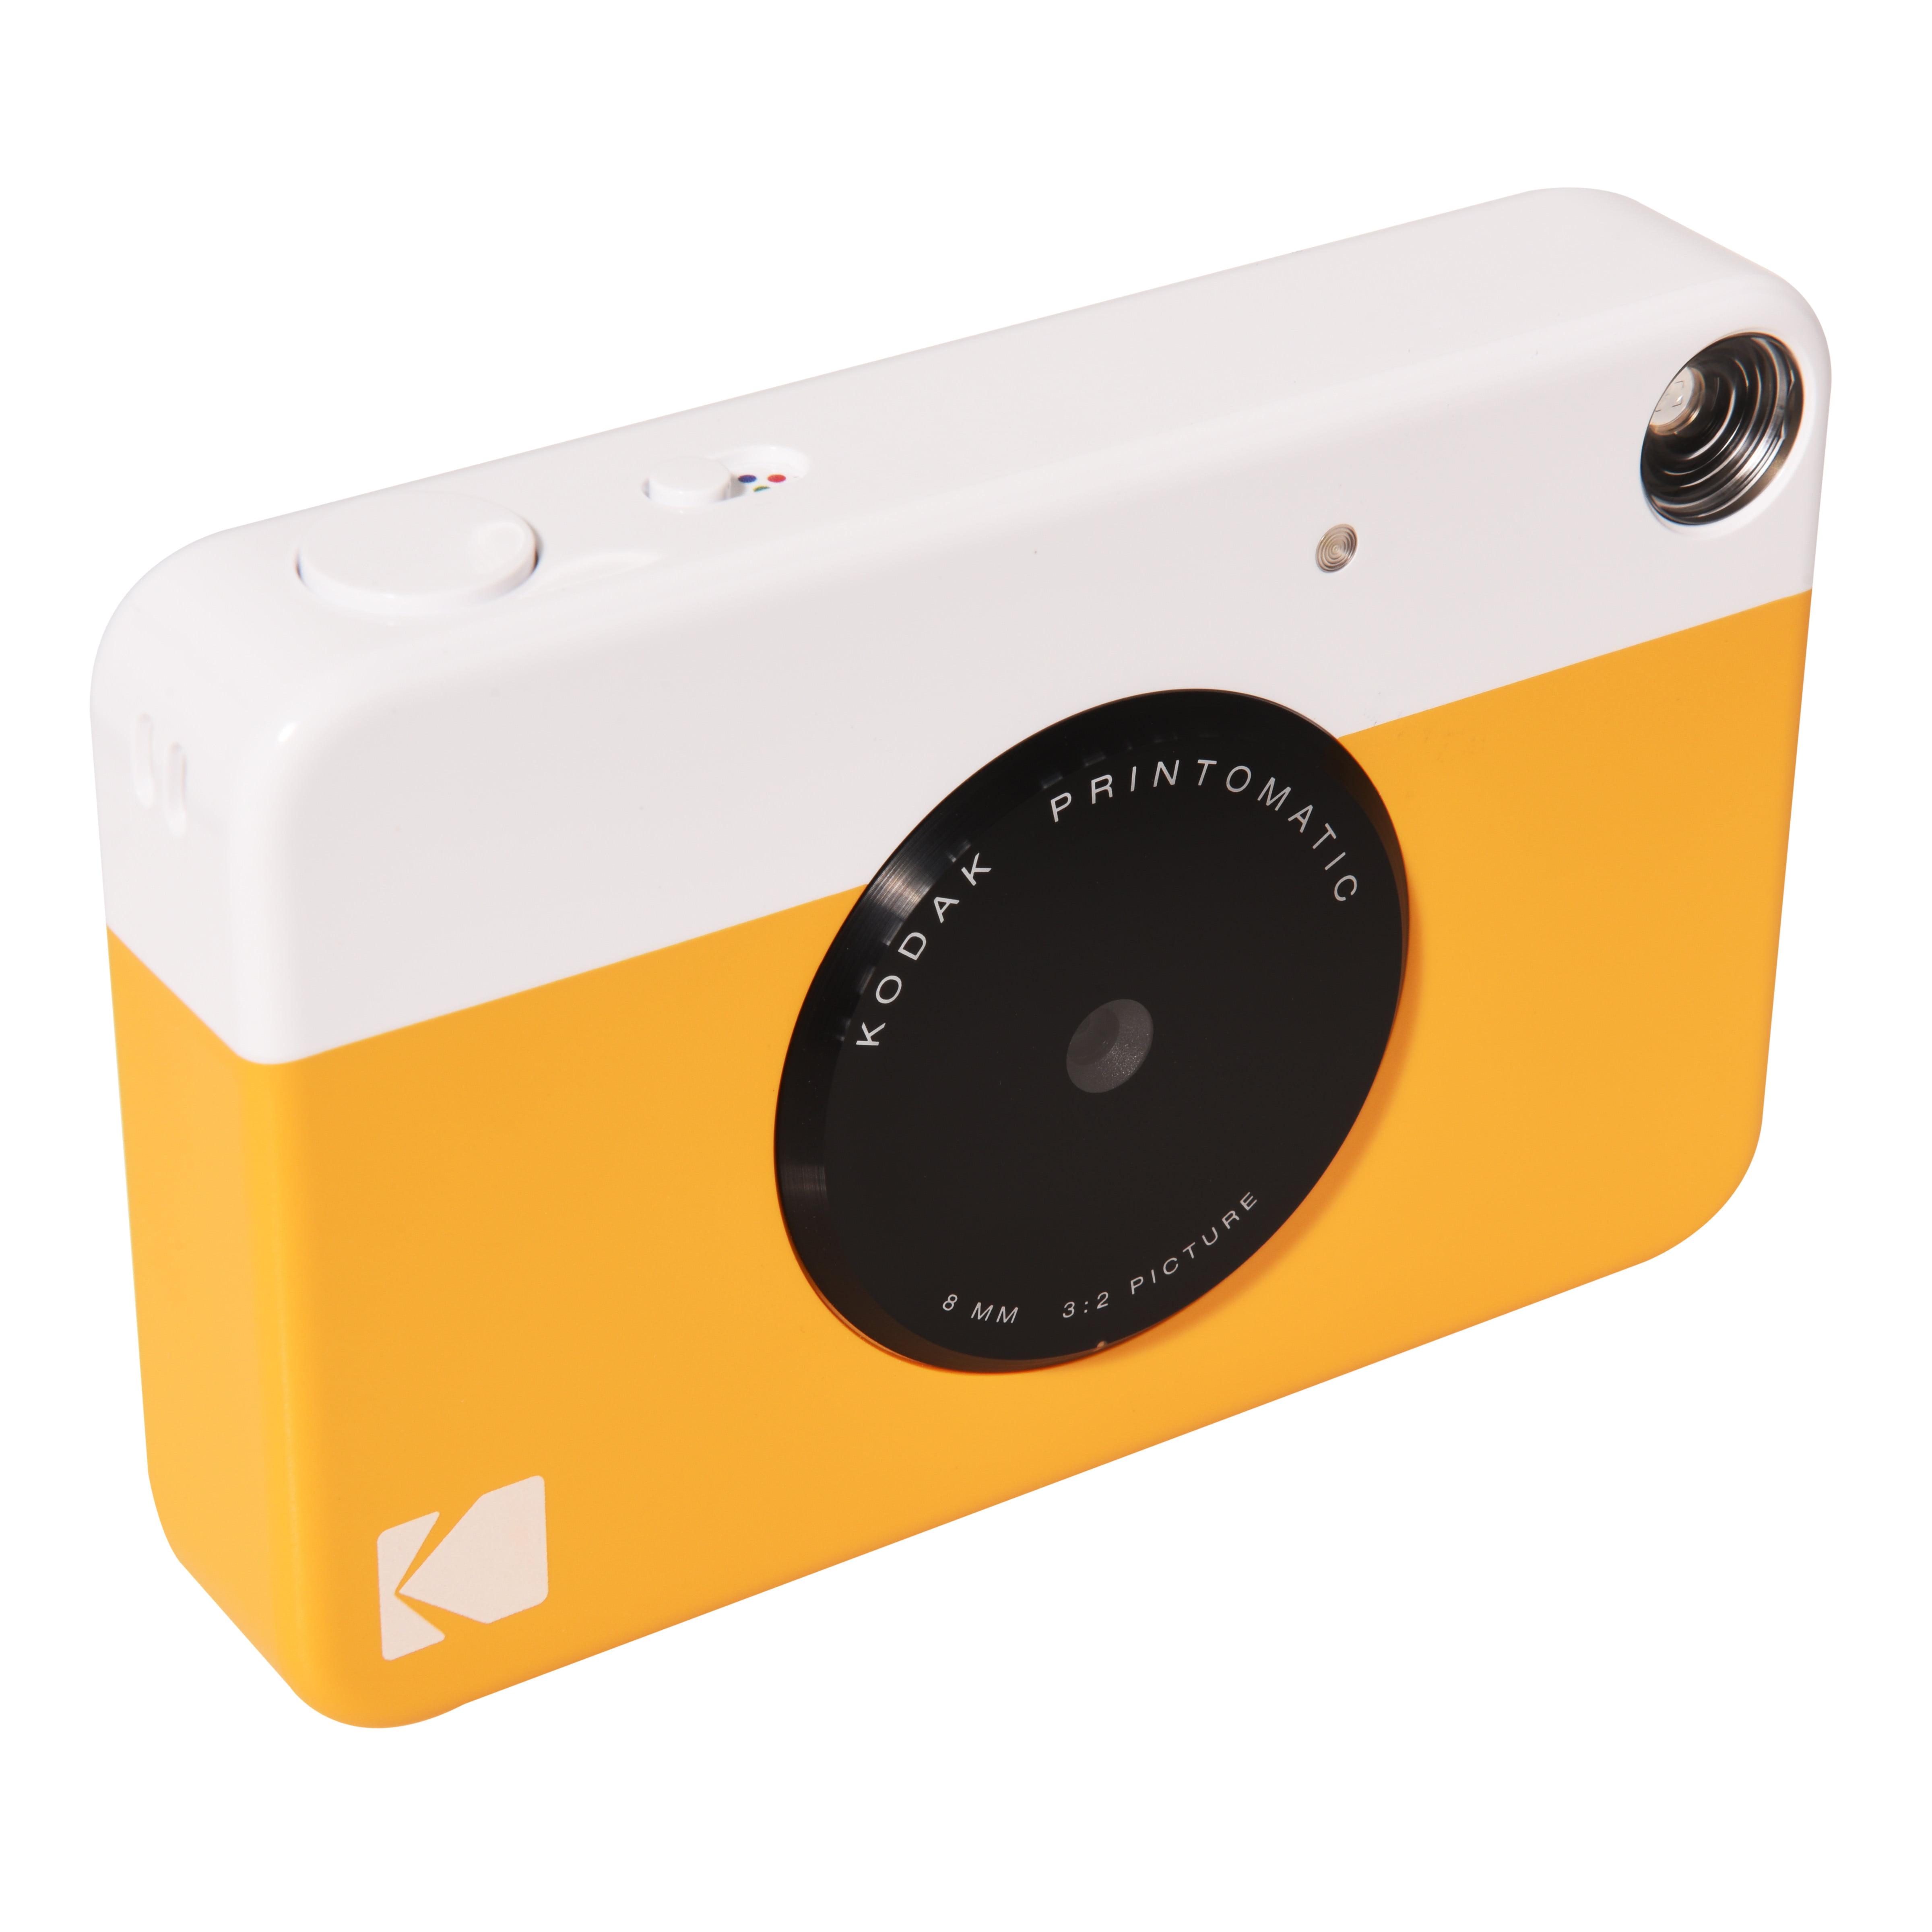 Kodak Printomatic Instant Digital Camera